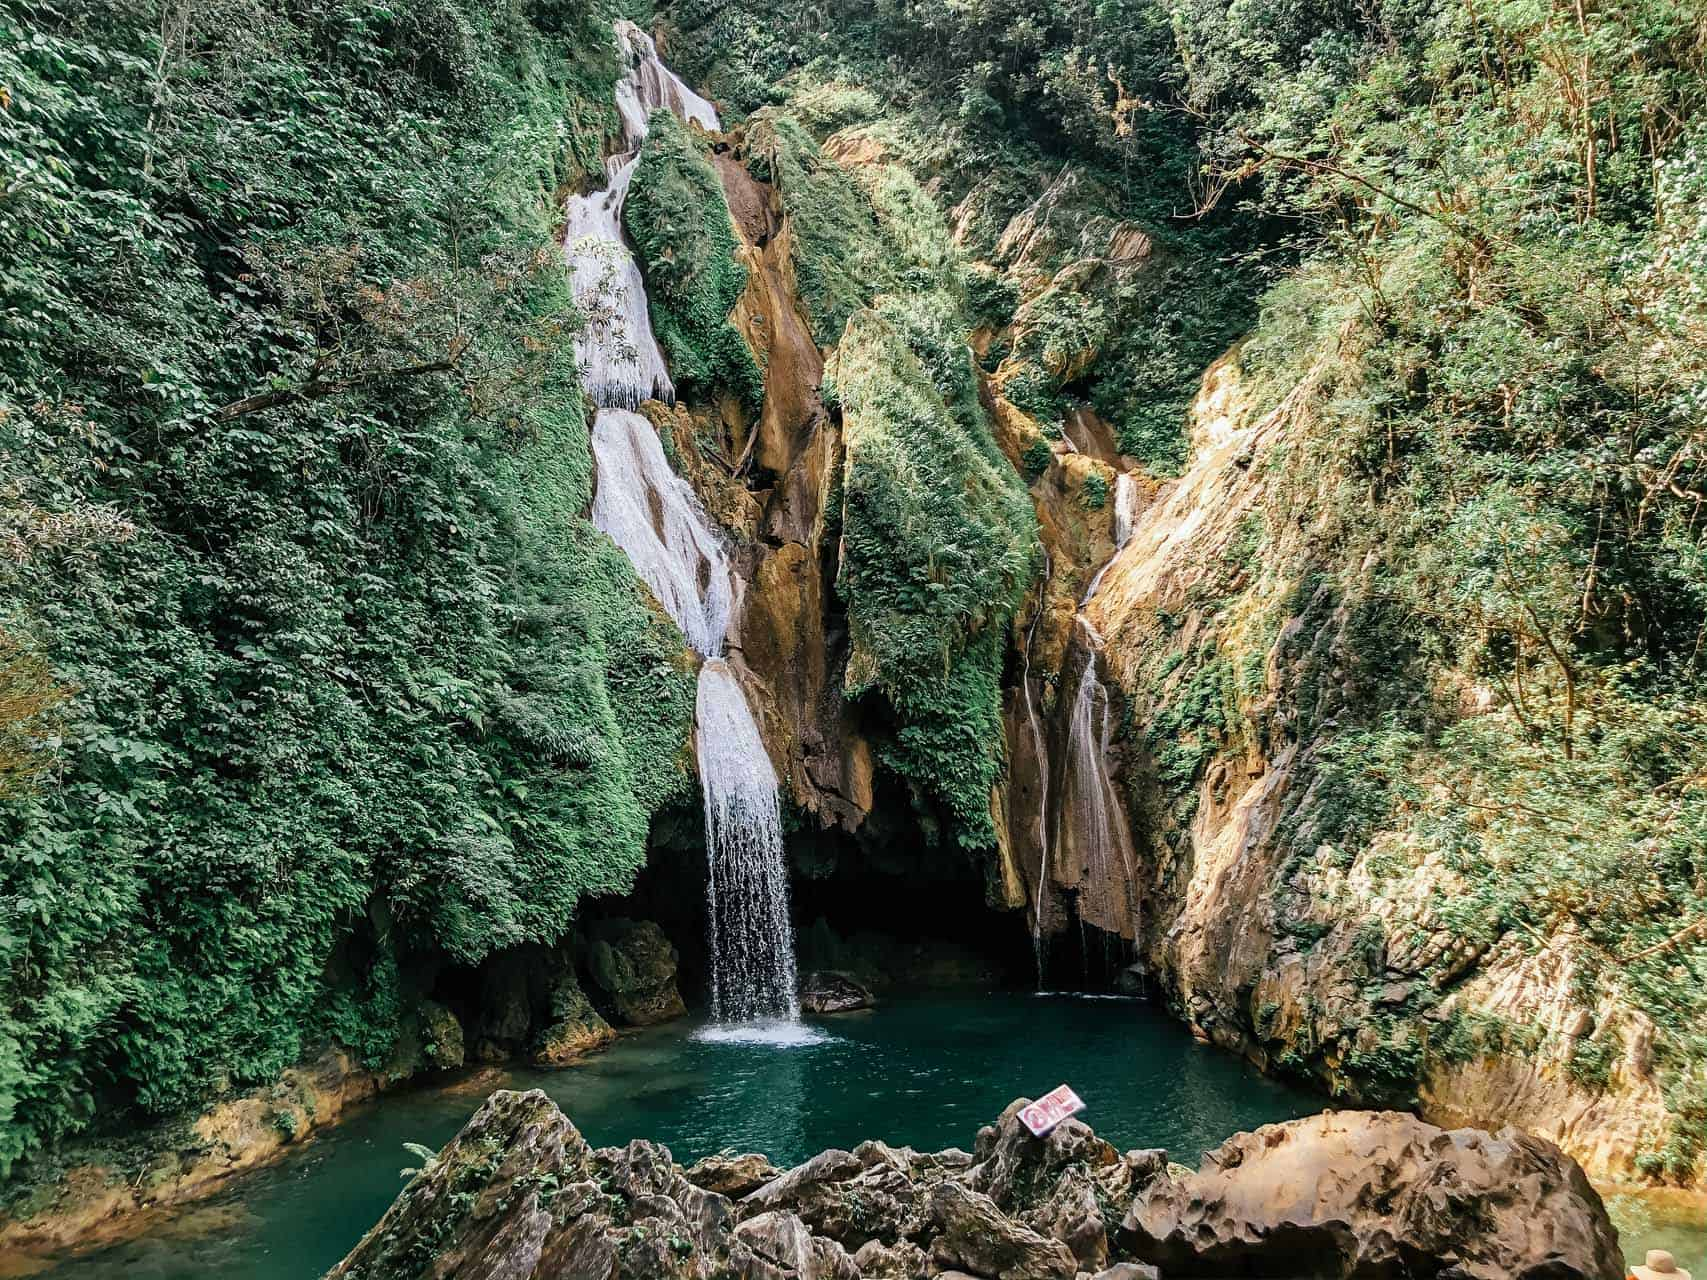 trinidad topes de collantes chutes eau cuba autrement 3